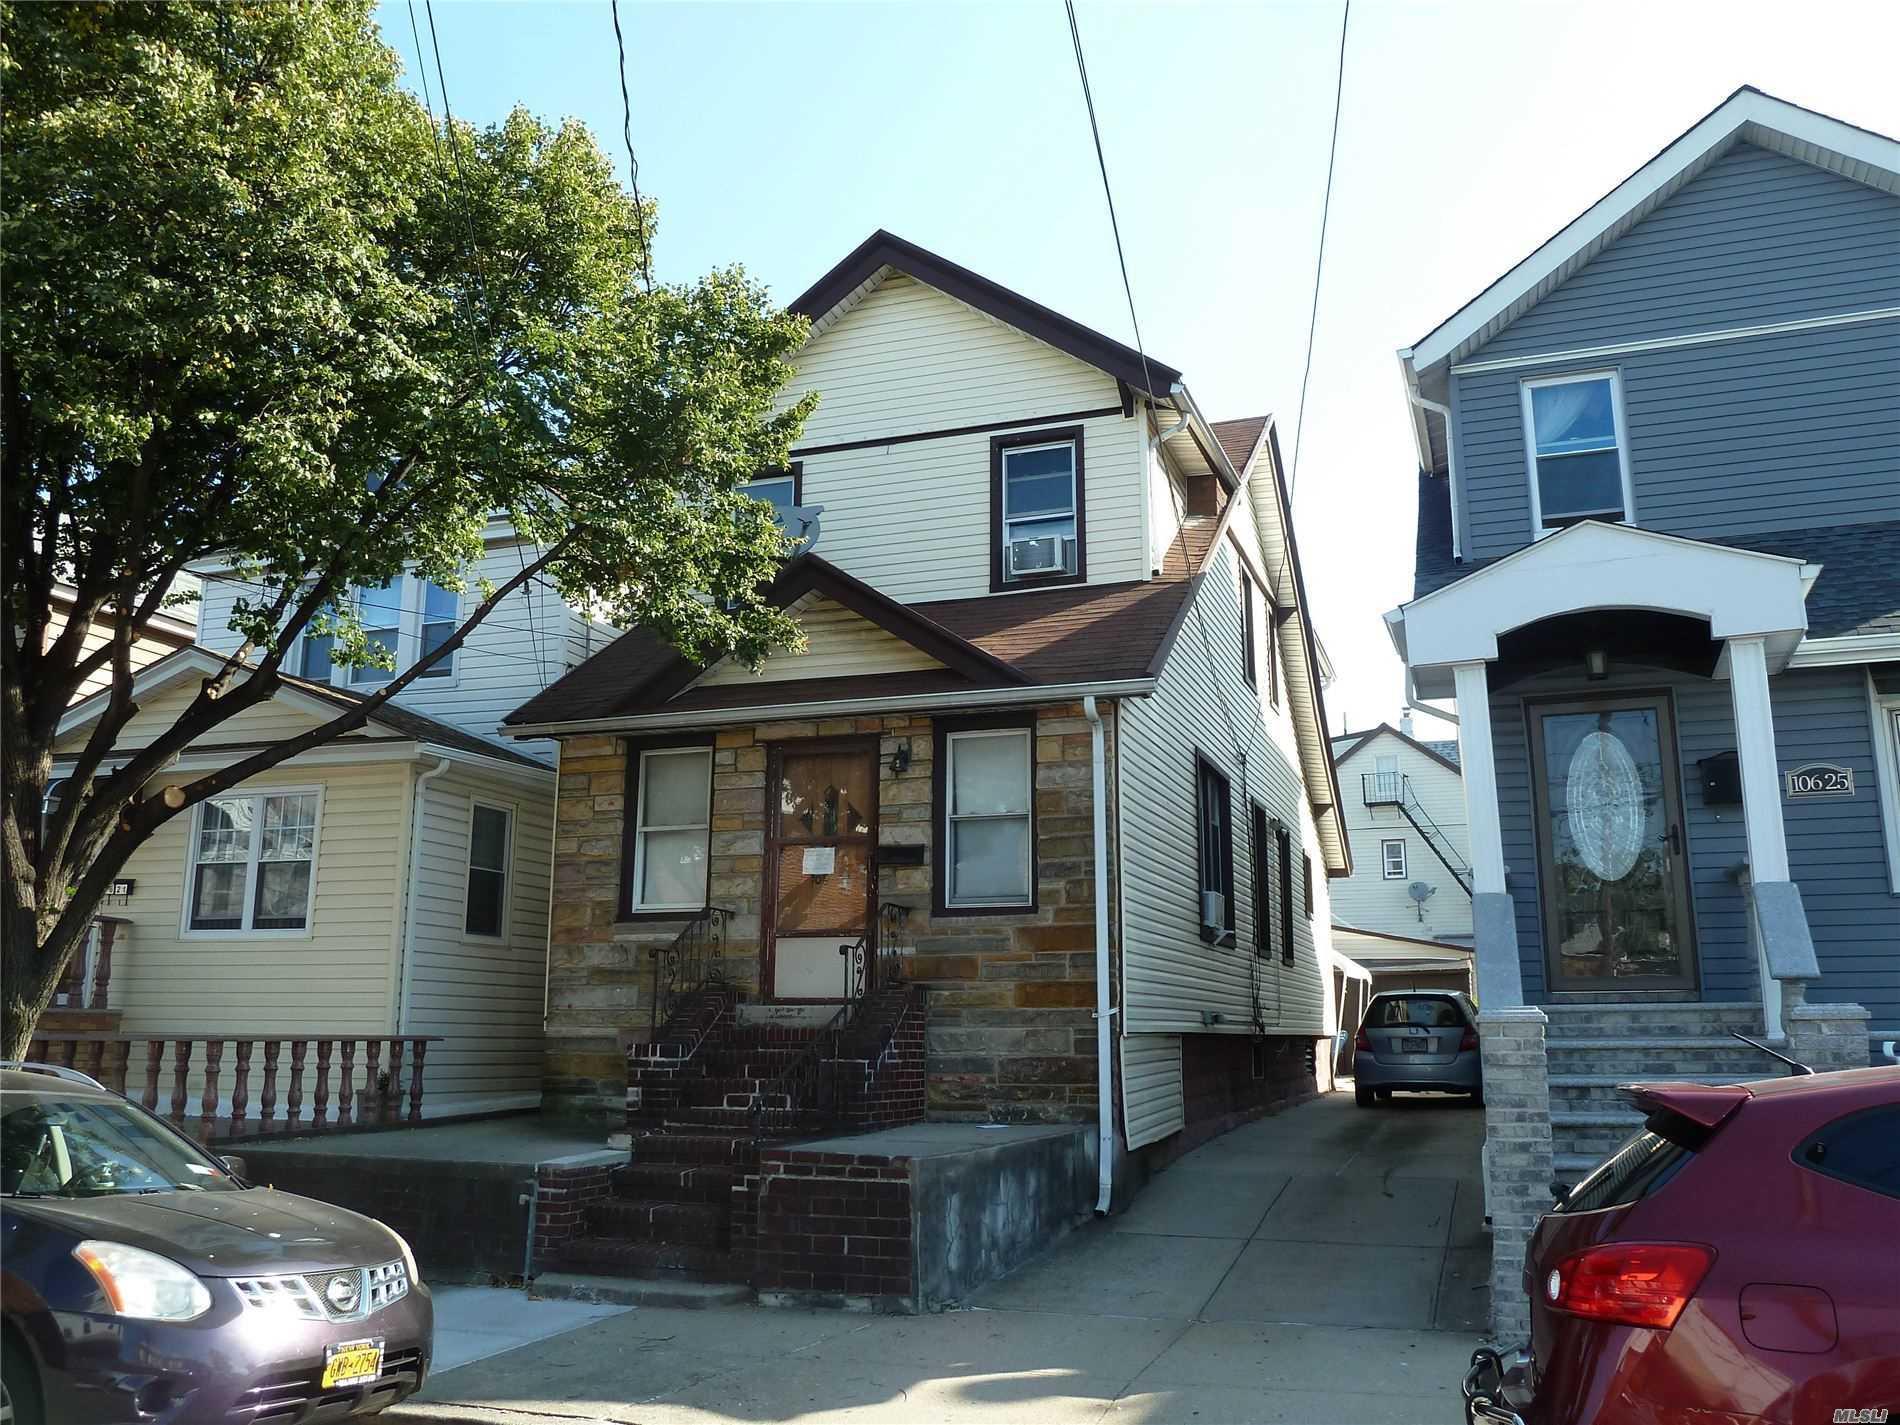 Property for sale at 106-23 95 Street, Ozone Park NY 11417, Ozone Park,  New York 11417